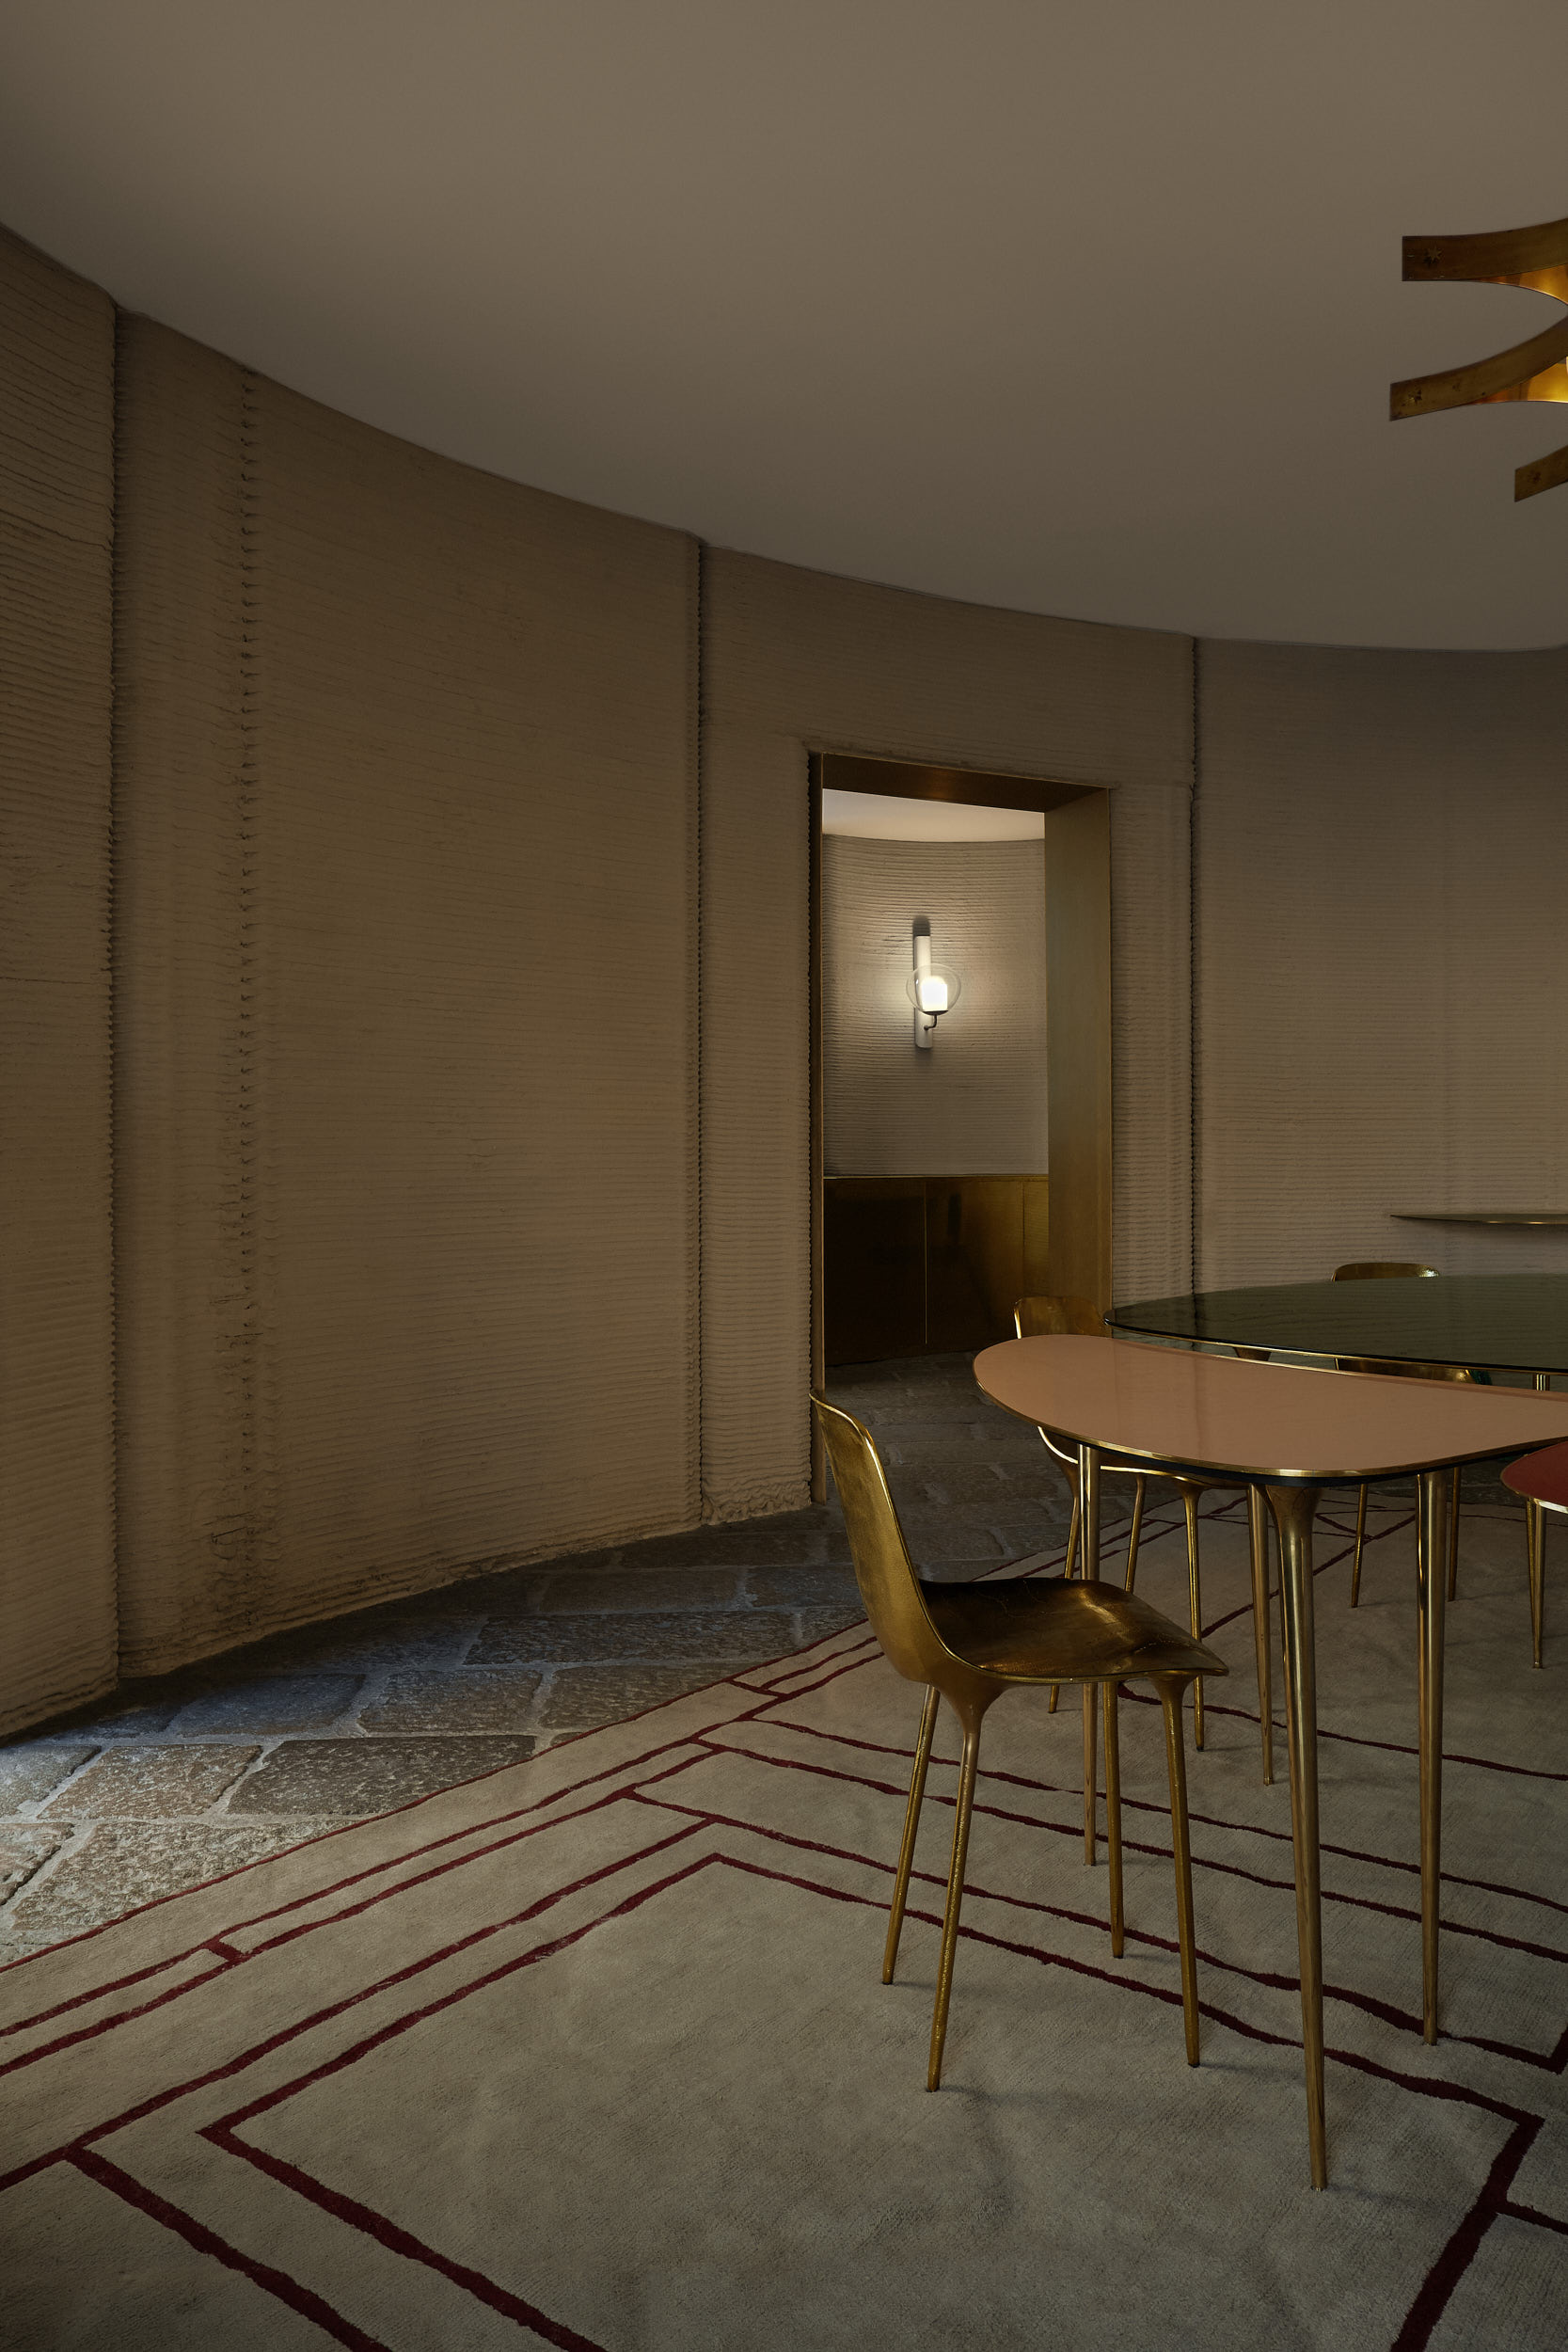 3D Housing 05 by CLS Architetti on Anniversary Magazine. Photo by Alex Lesage — threefold 6.jpg